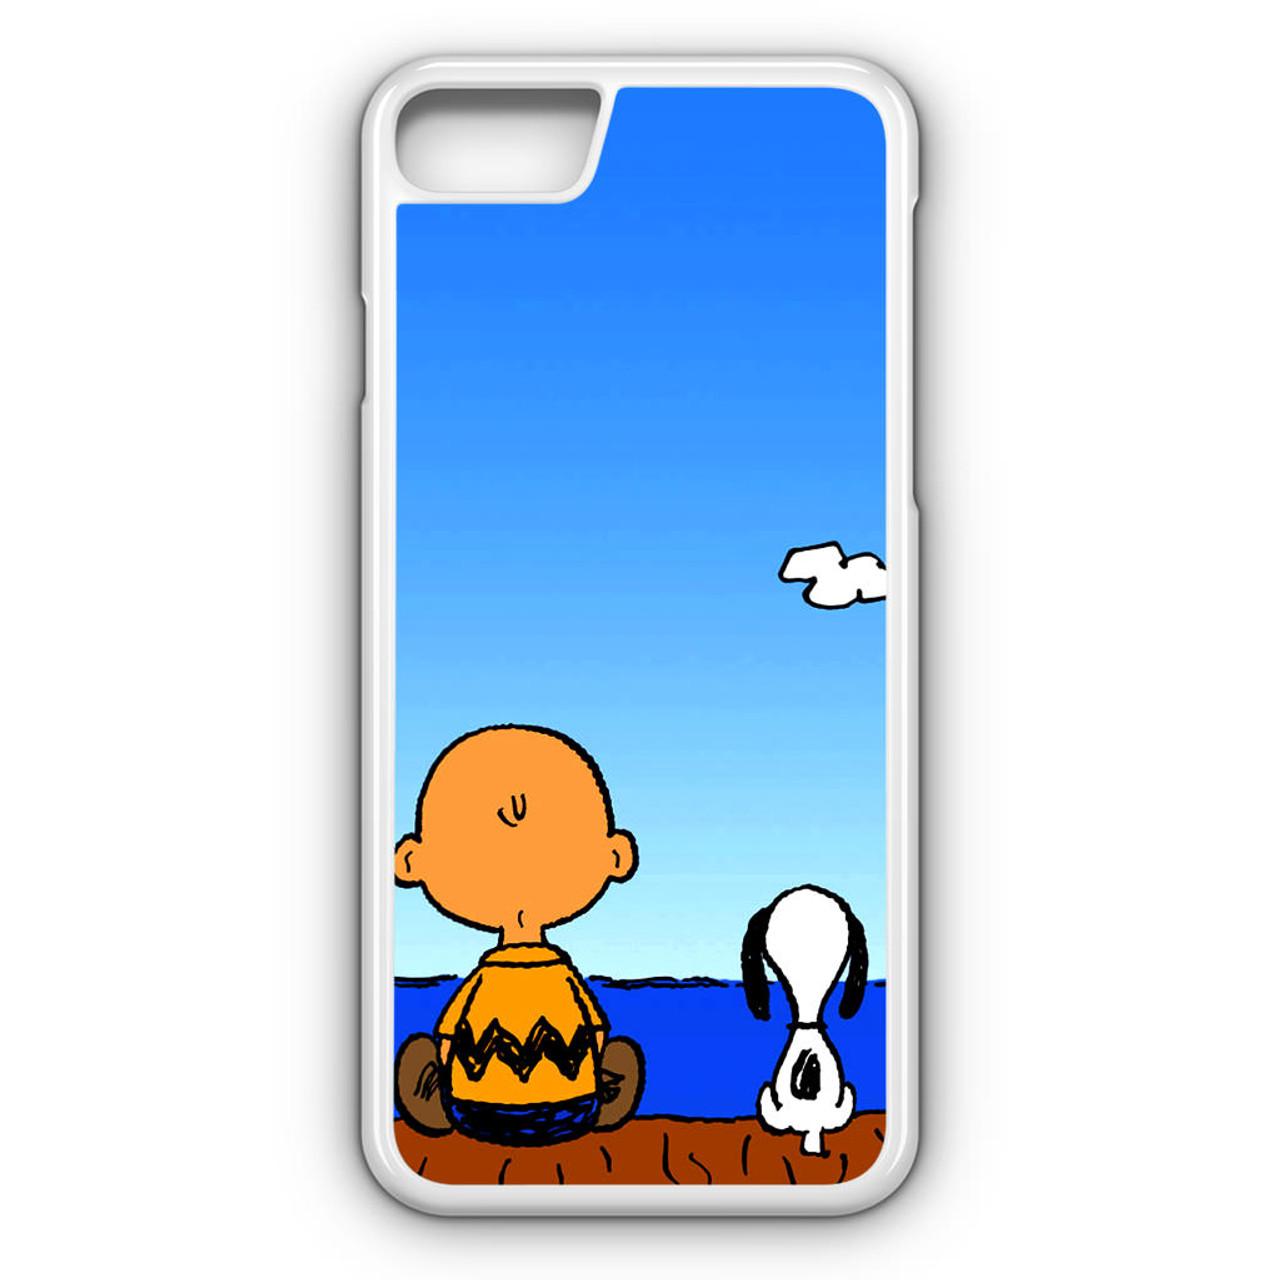 Snoopy Charlie Brown iphone case